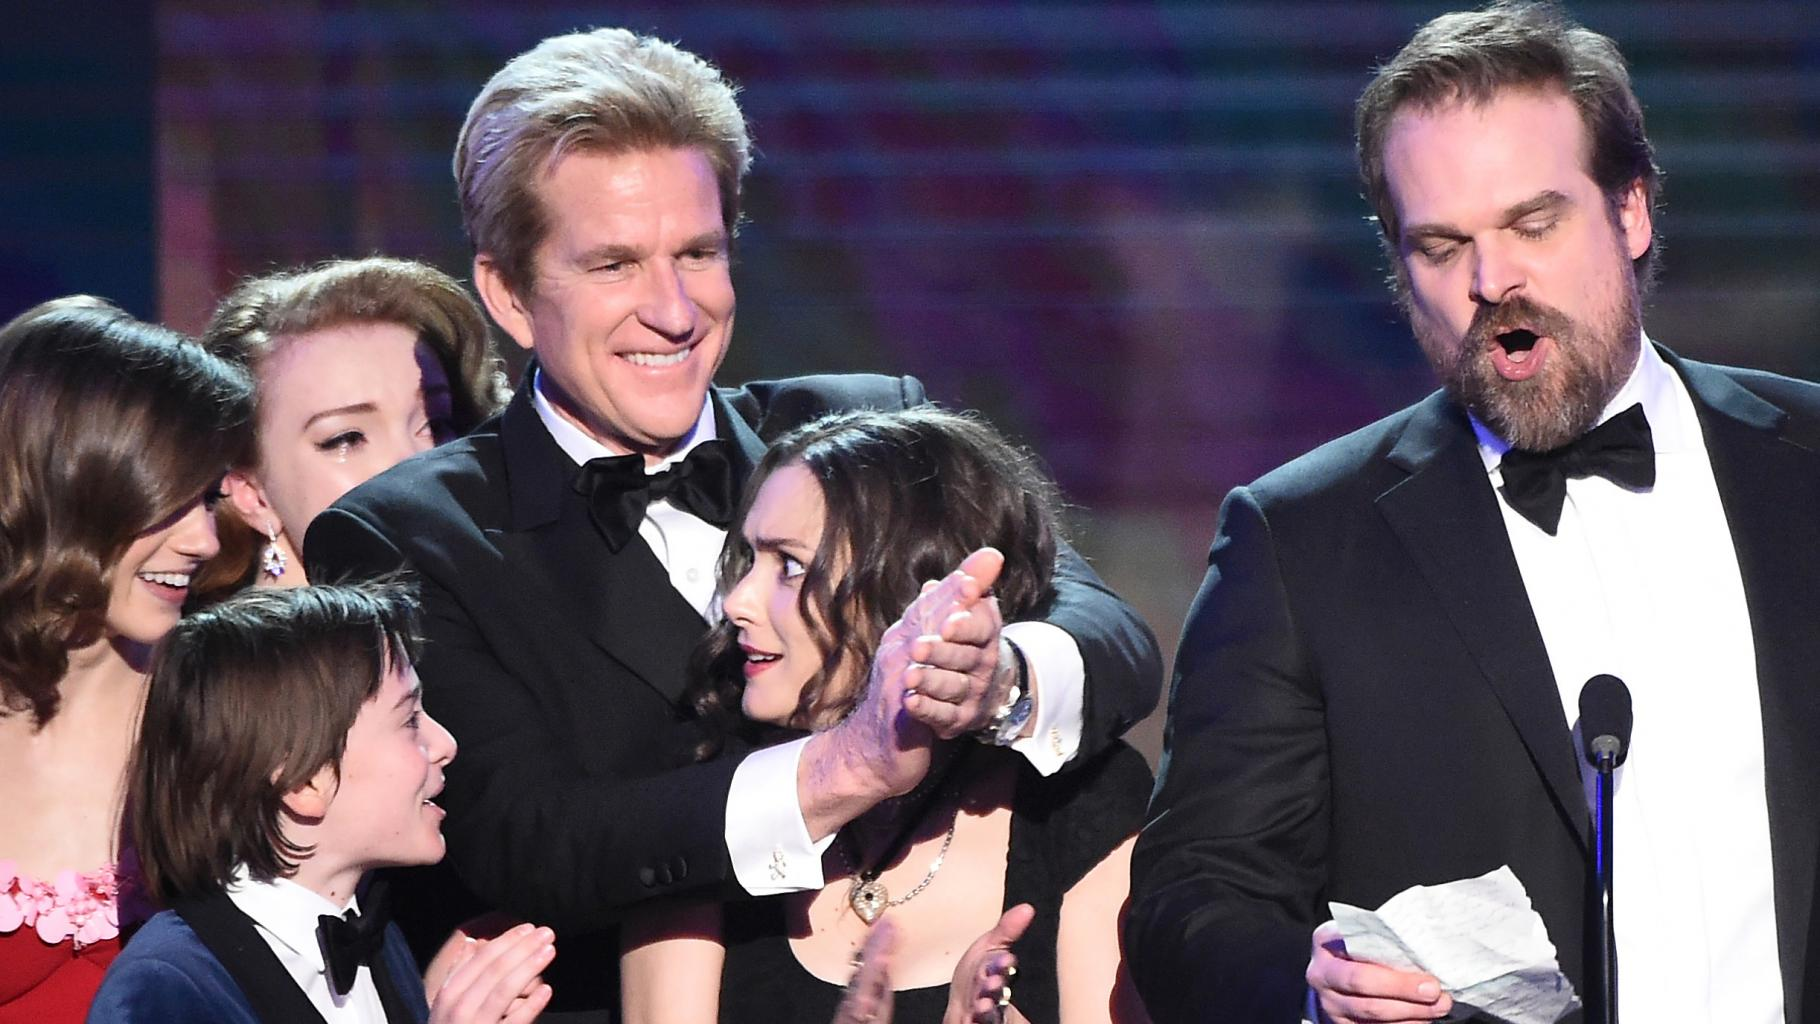 Winona Ryder  's Facial Expressions Steal the Show at SAG Awards